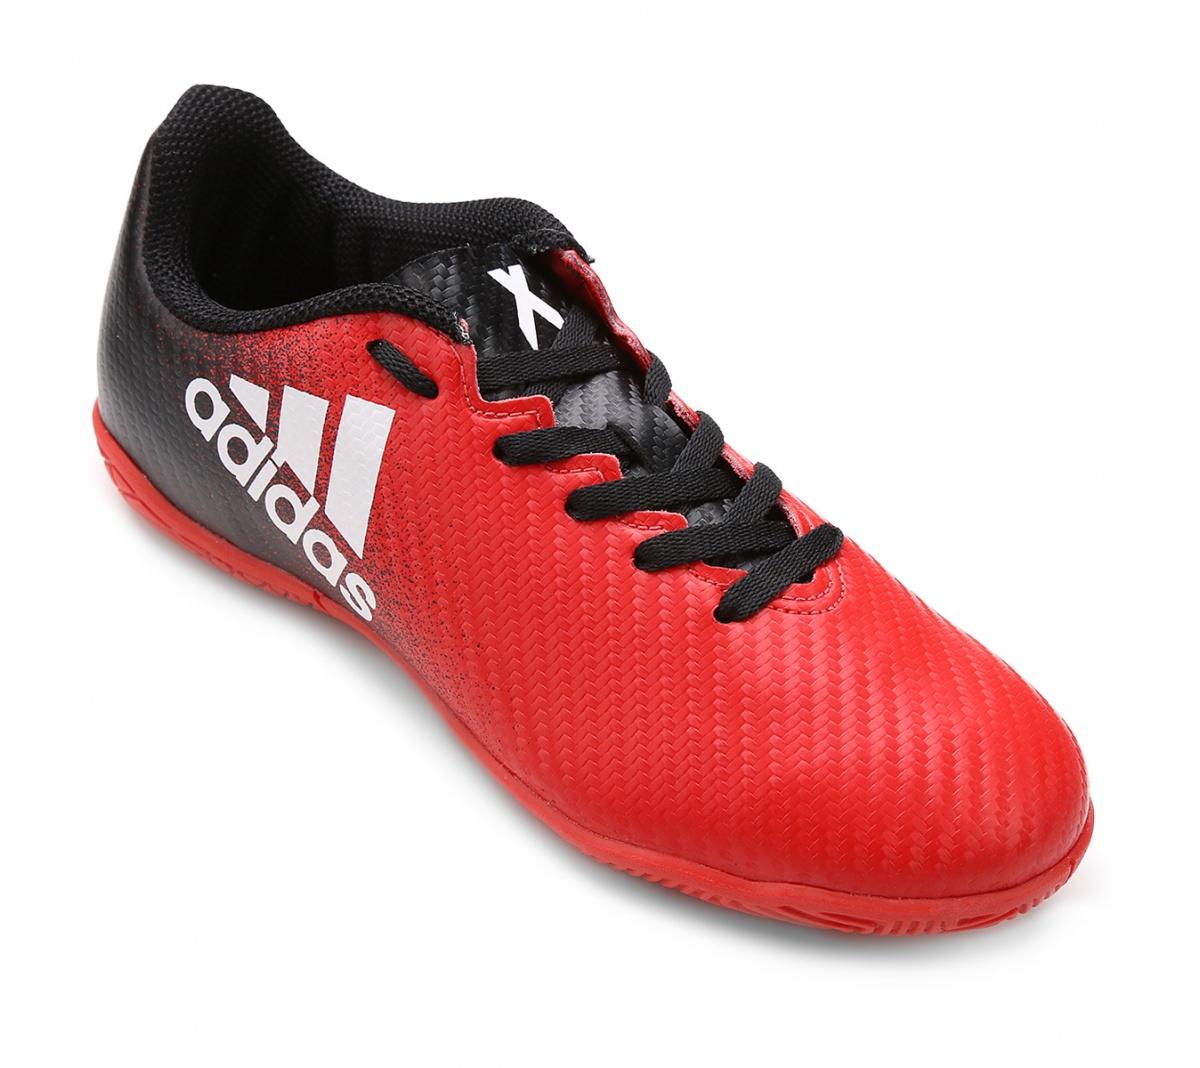 Tênis Adidas X16.4 Futsal Infantil - Mundo do Futebol 55956a03d72a6